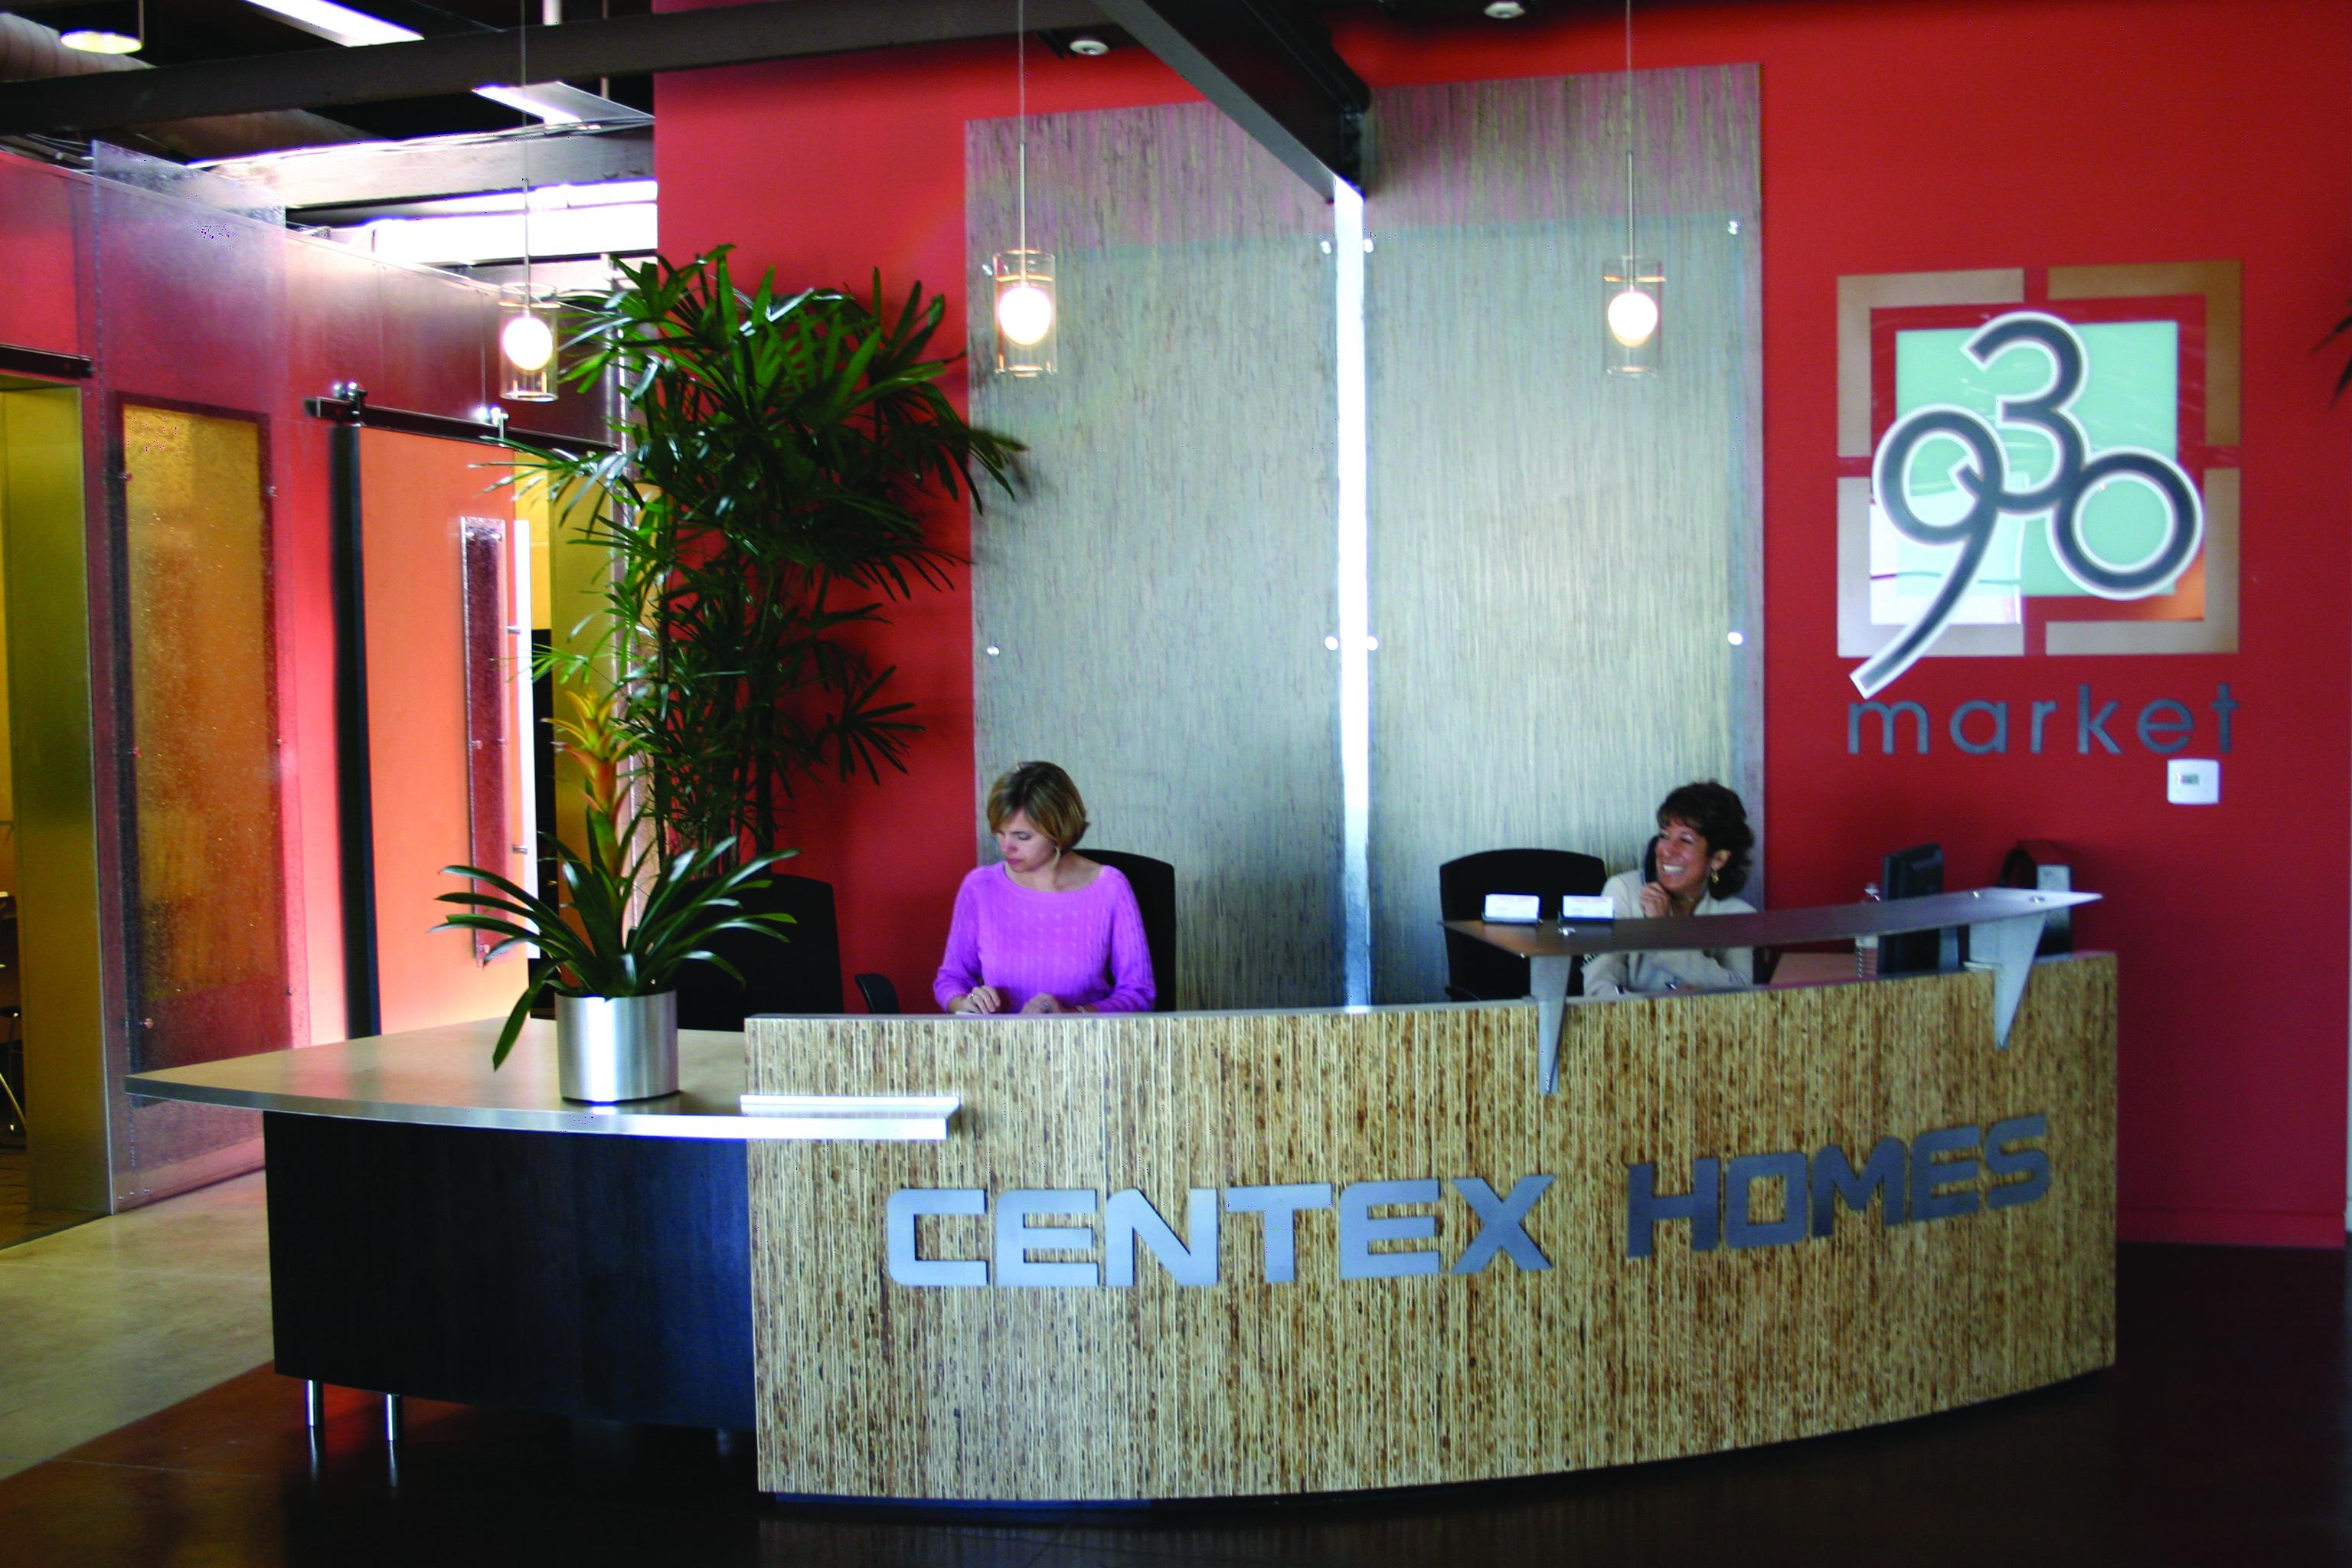 Kirei-Board-Commercial-Office-Desk-Lobby-Centex-3